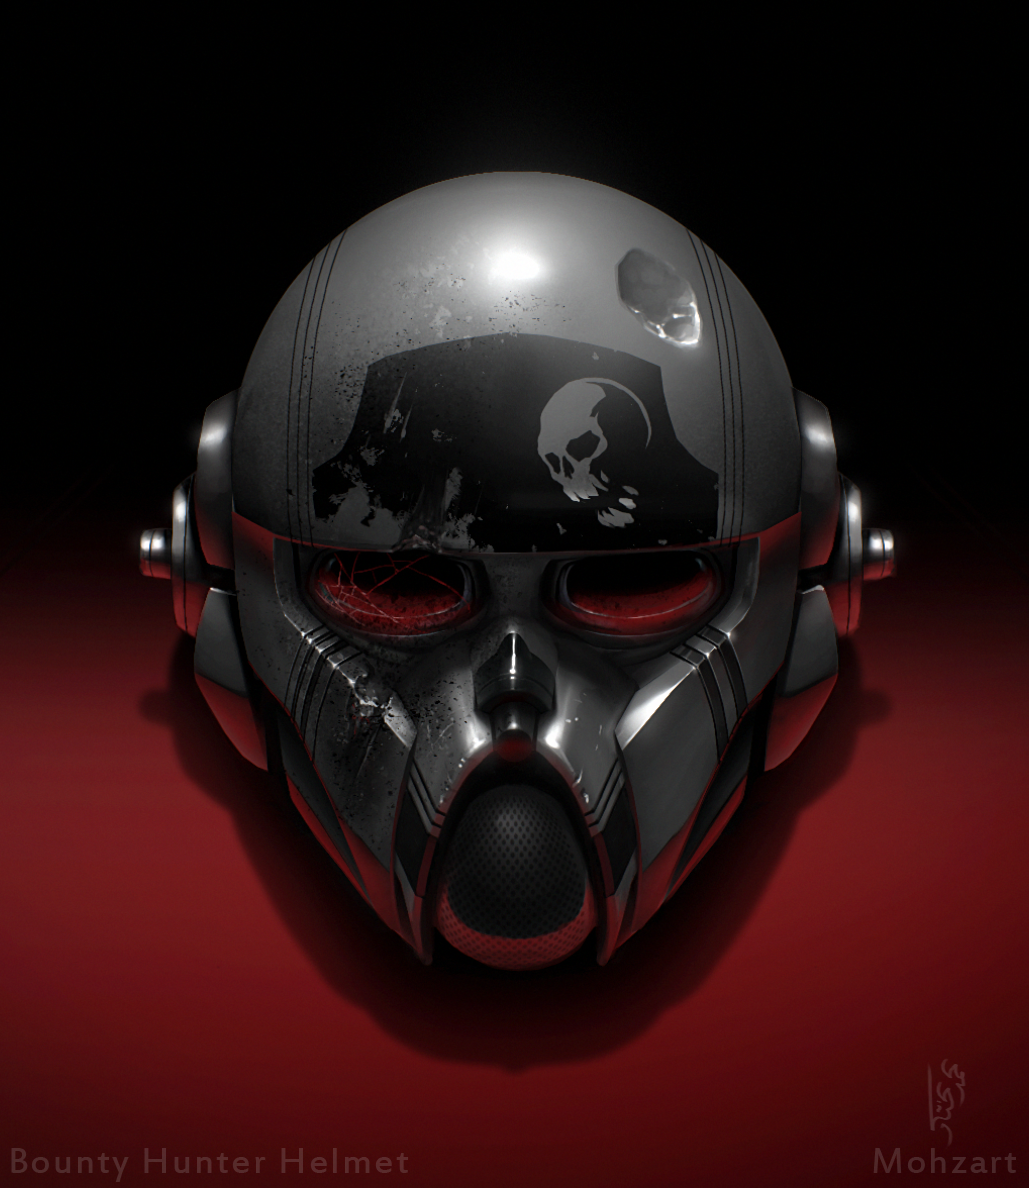 Bounty Hunter Helmet by mohzart